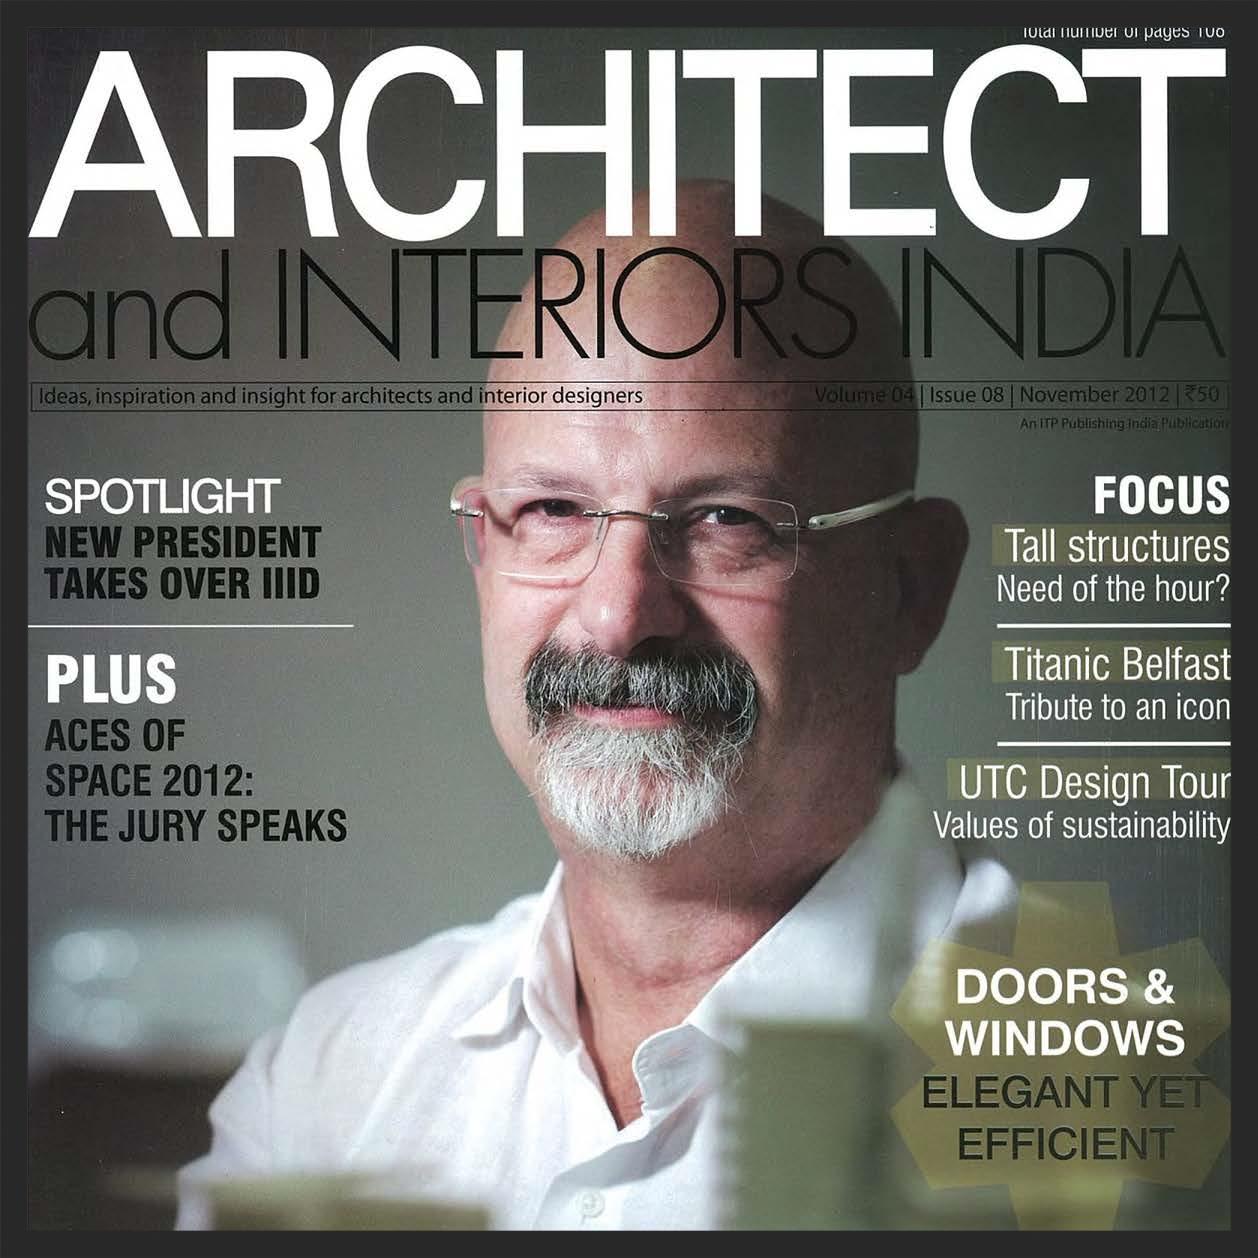 Architect and Interiors